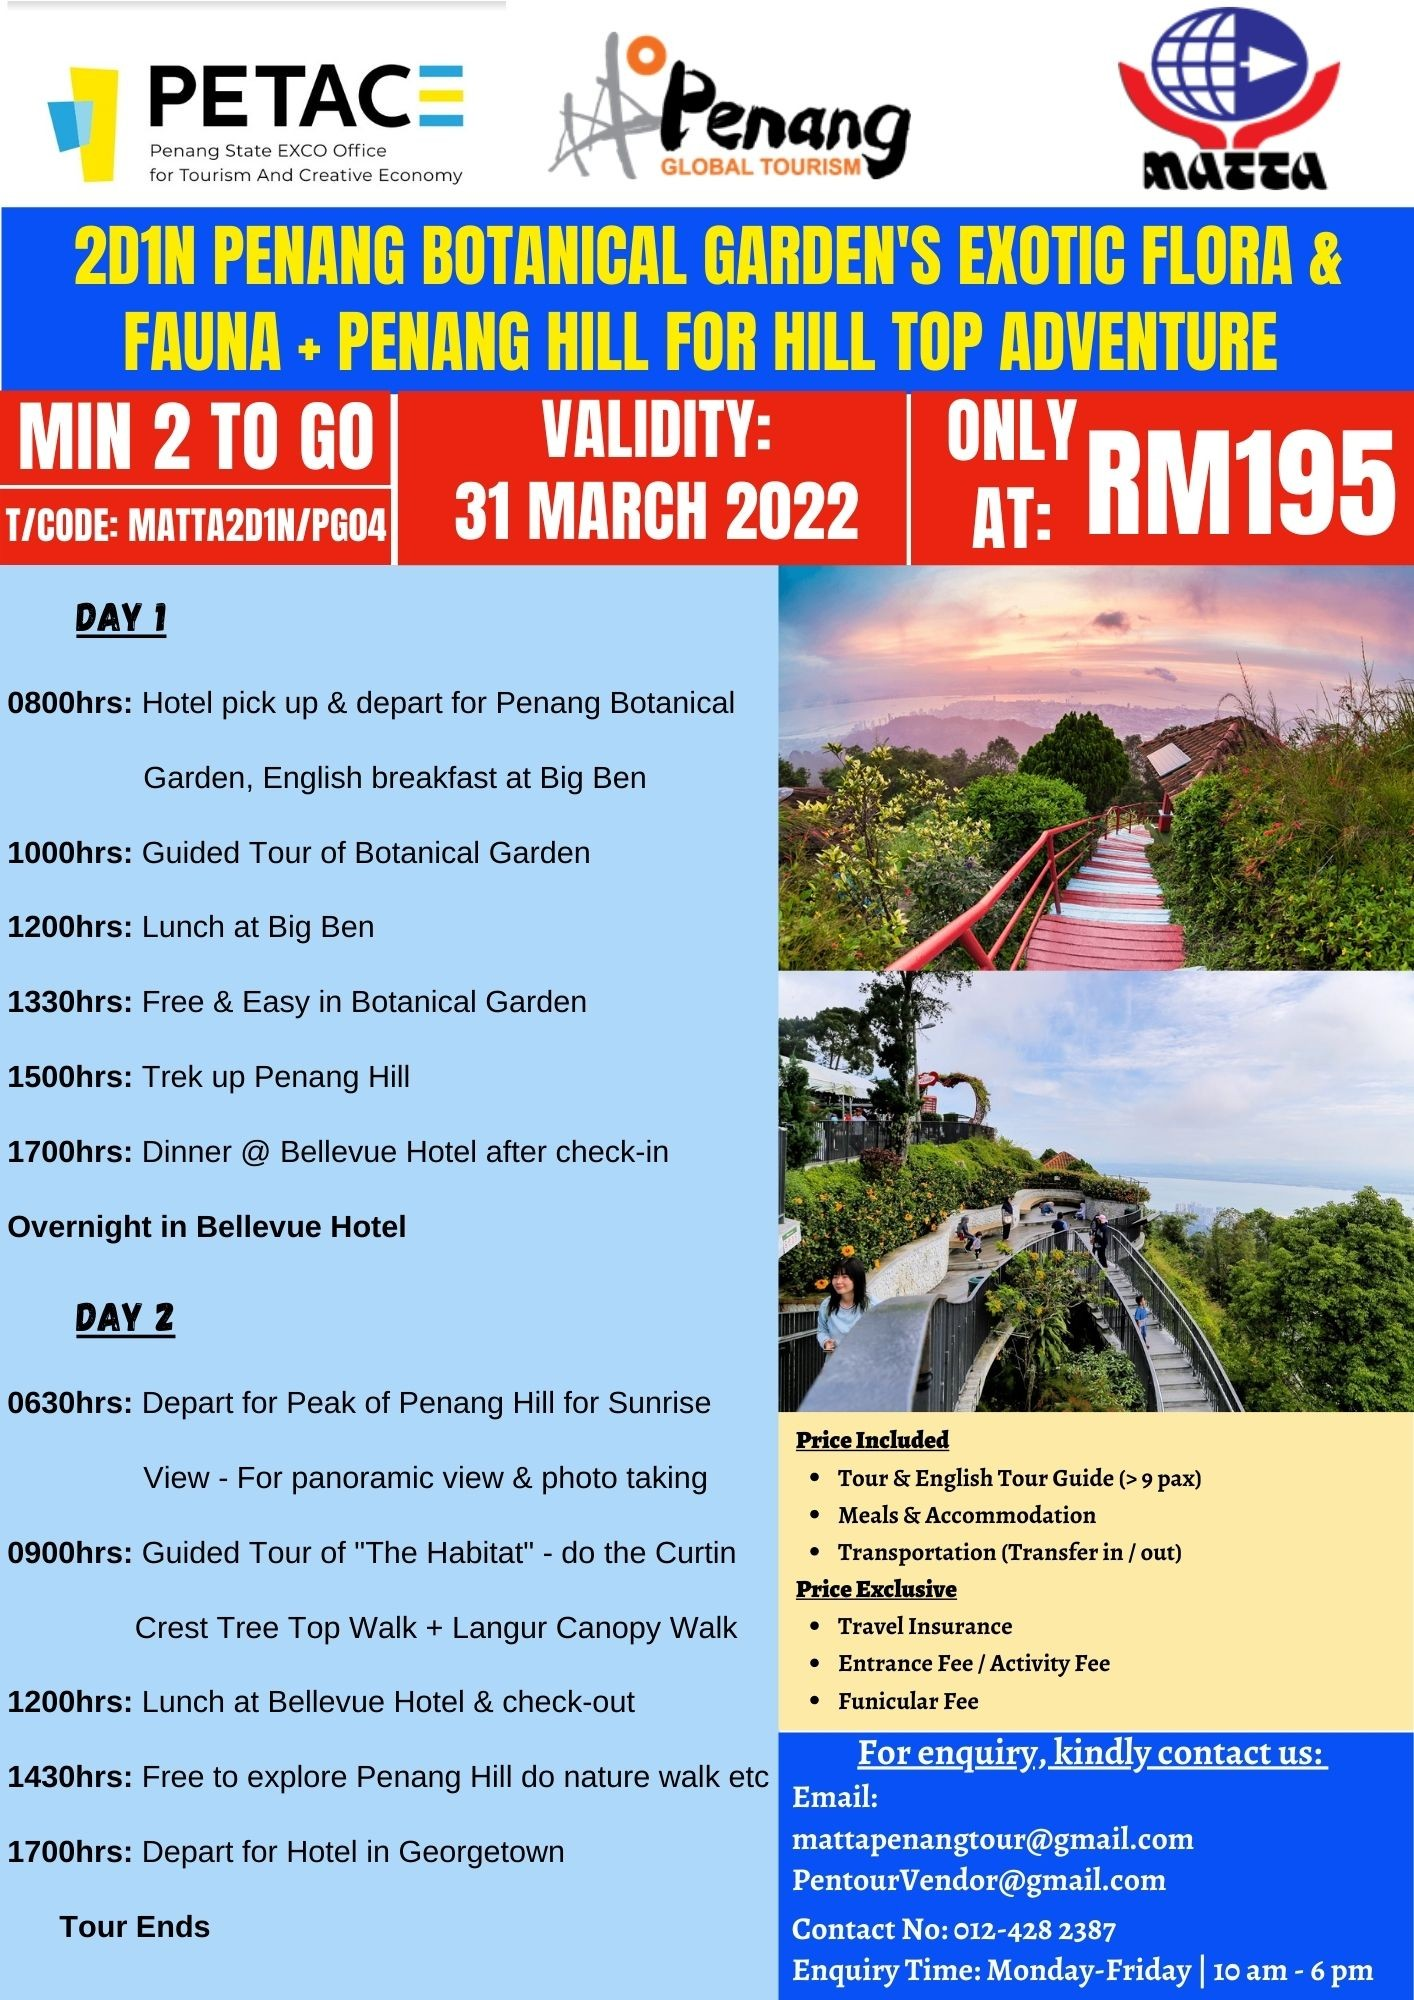 2D1N Penang Botanical Garden's Exotic Flora & Fauna + Penang Hill for Hill Top Adventure